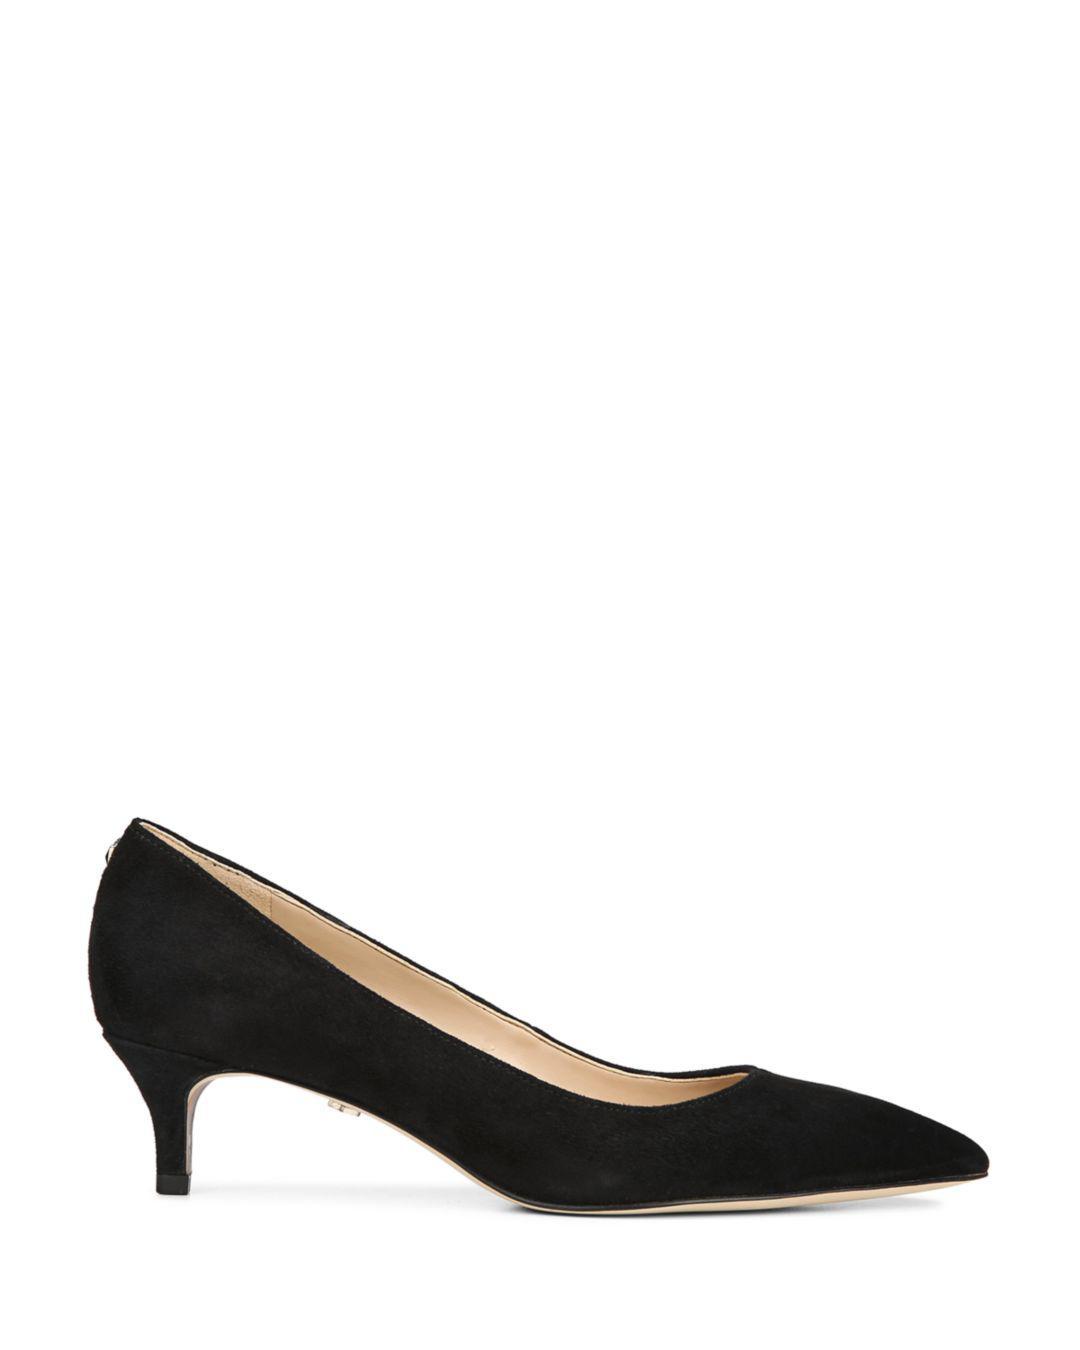 aac223965bef Lyst - Sam Edelman Women s Dori Pointed Toe Kitten Heel Pumps in Black -  Save 1%